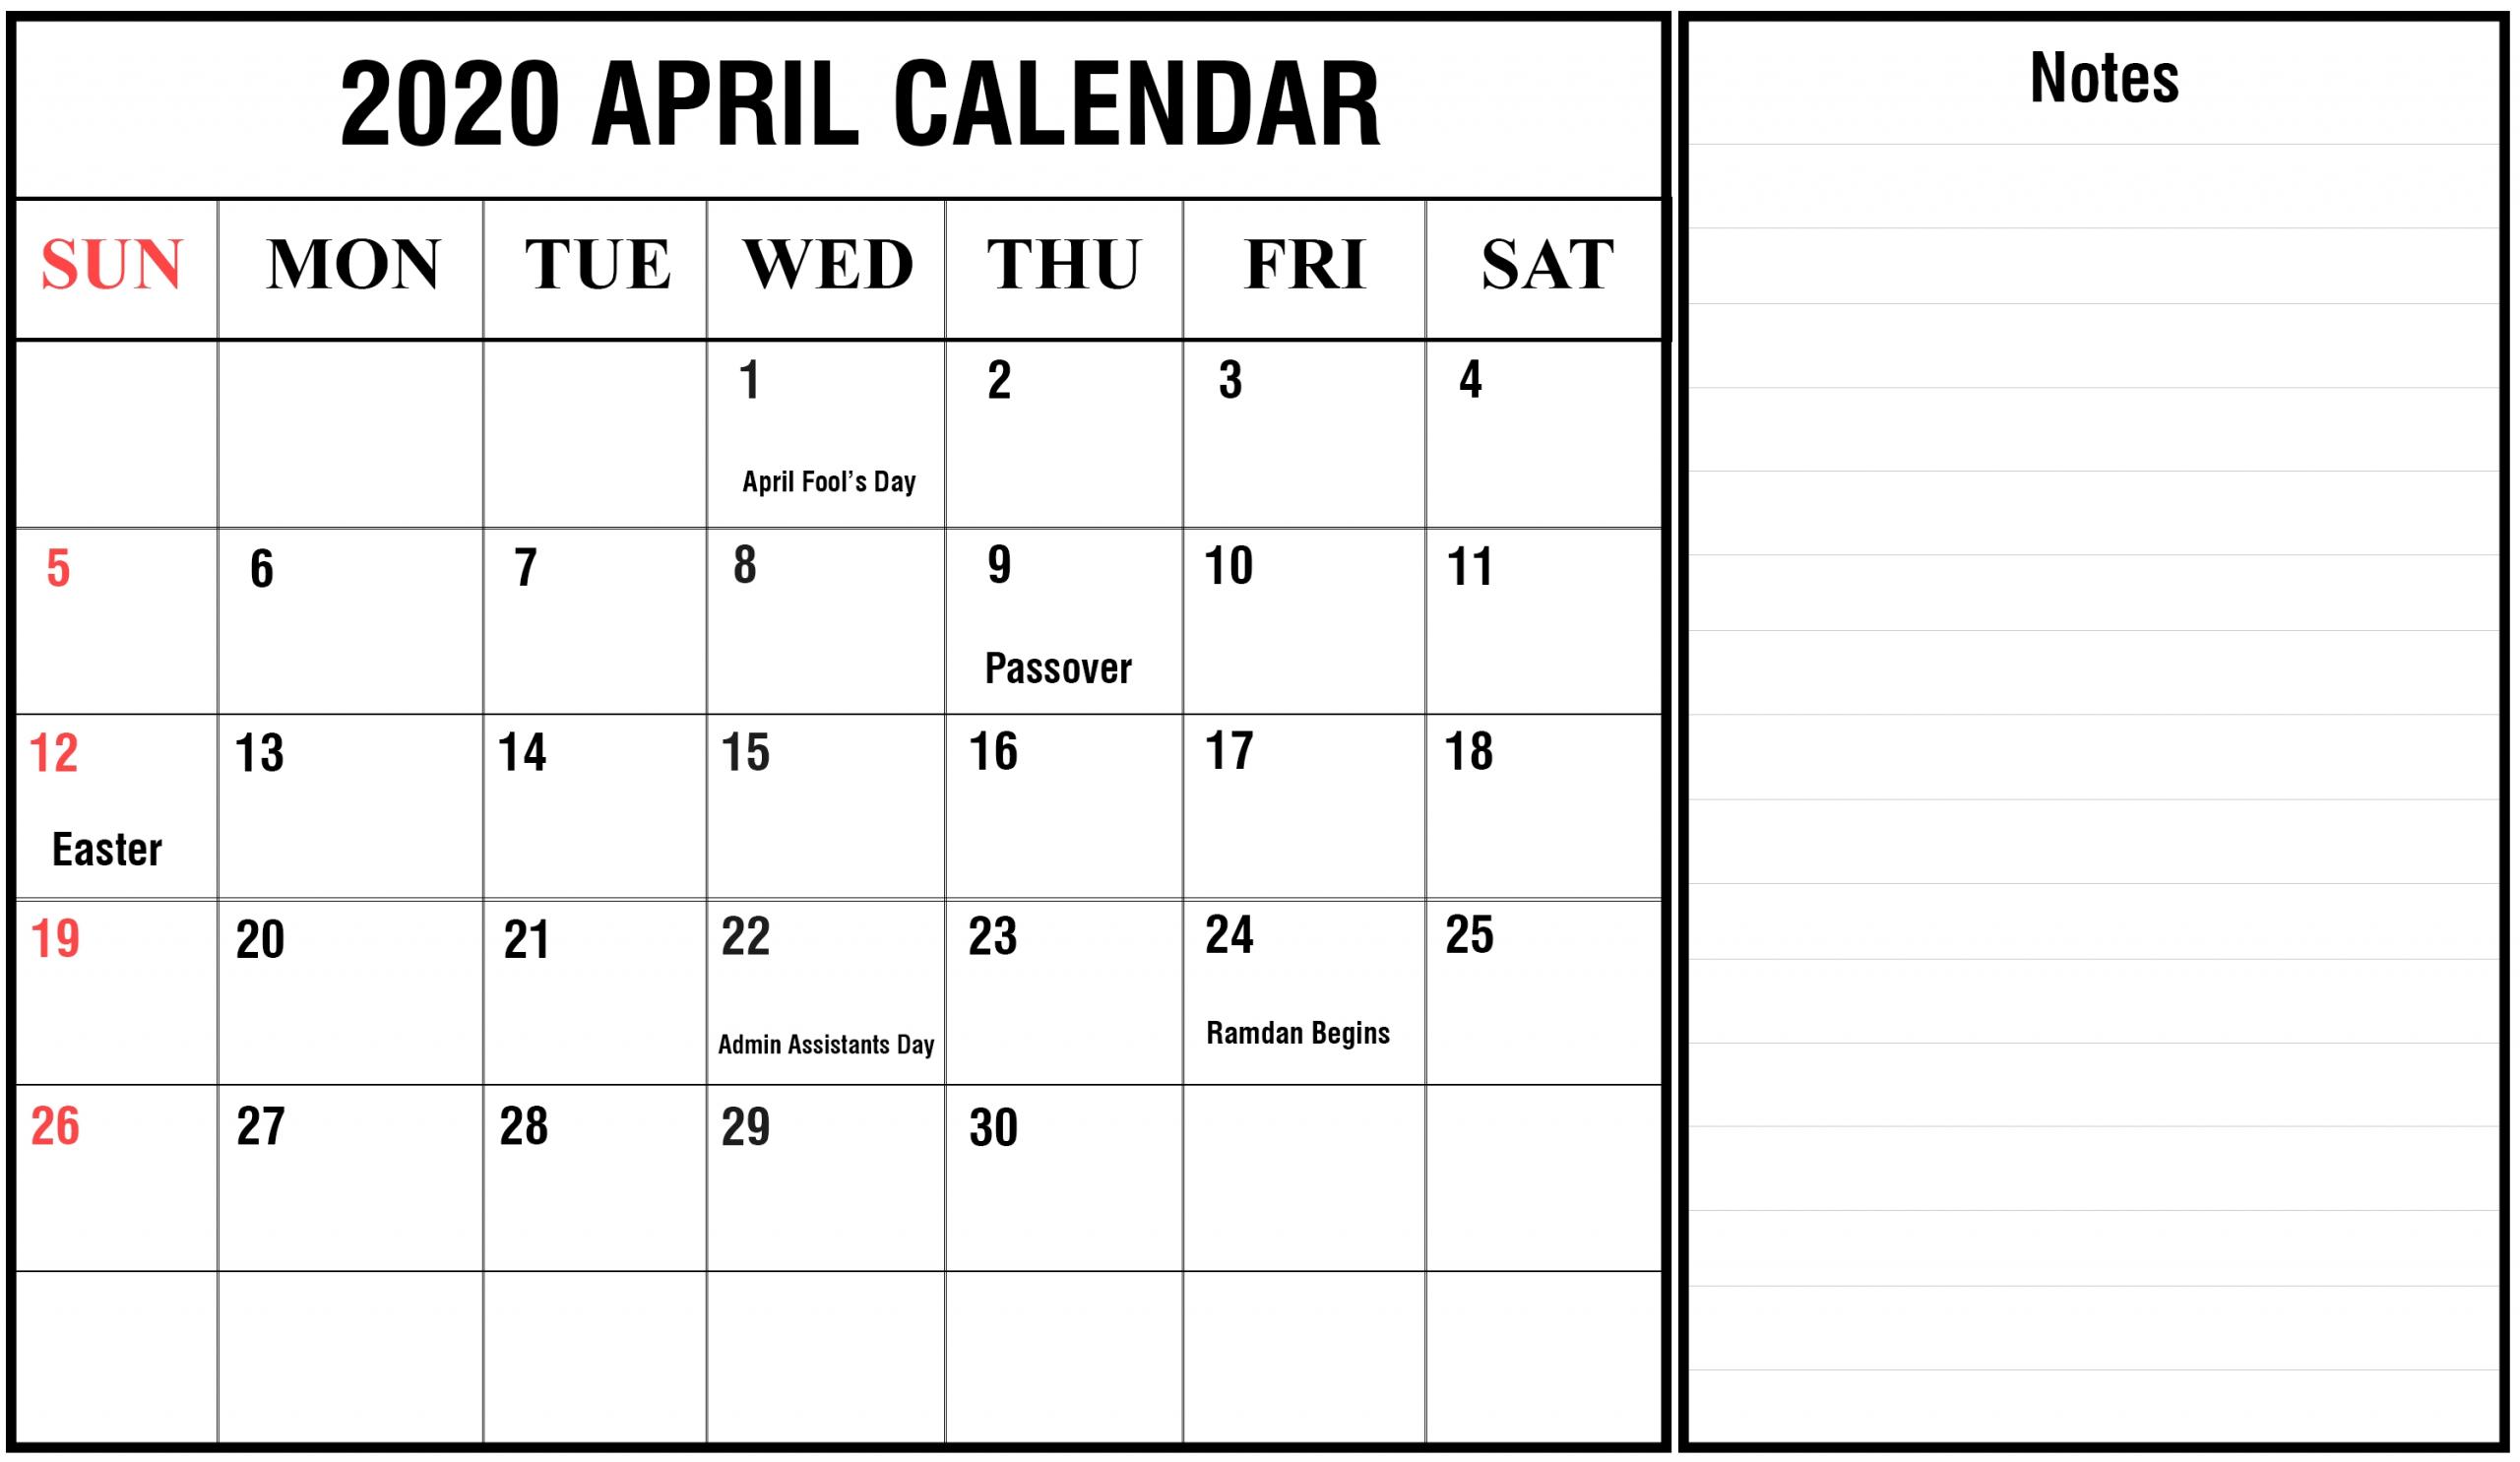 Free April Calendar 2020 Printable Editable Template